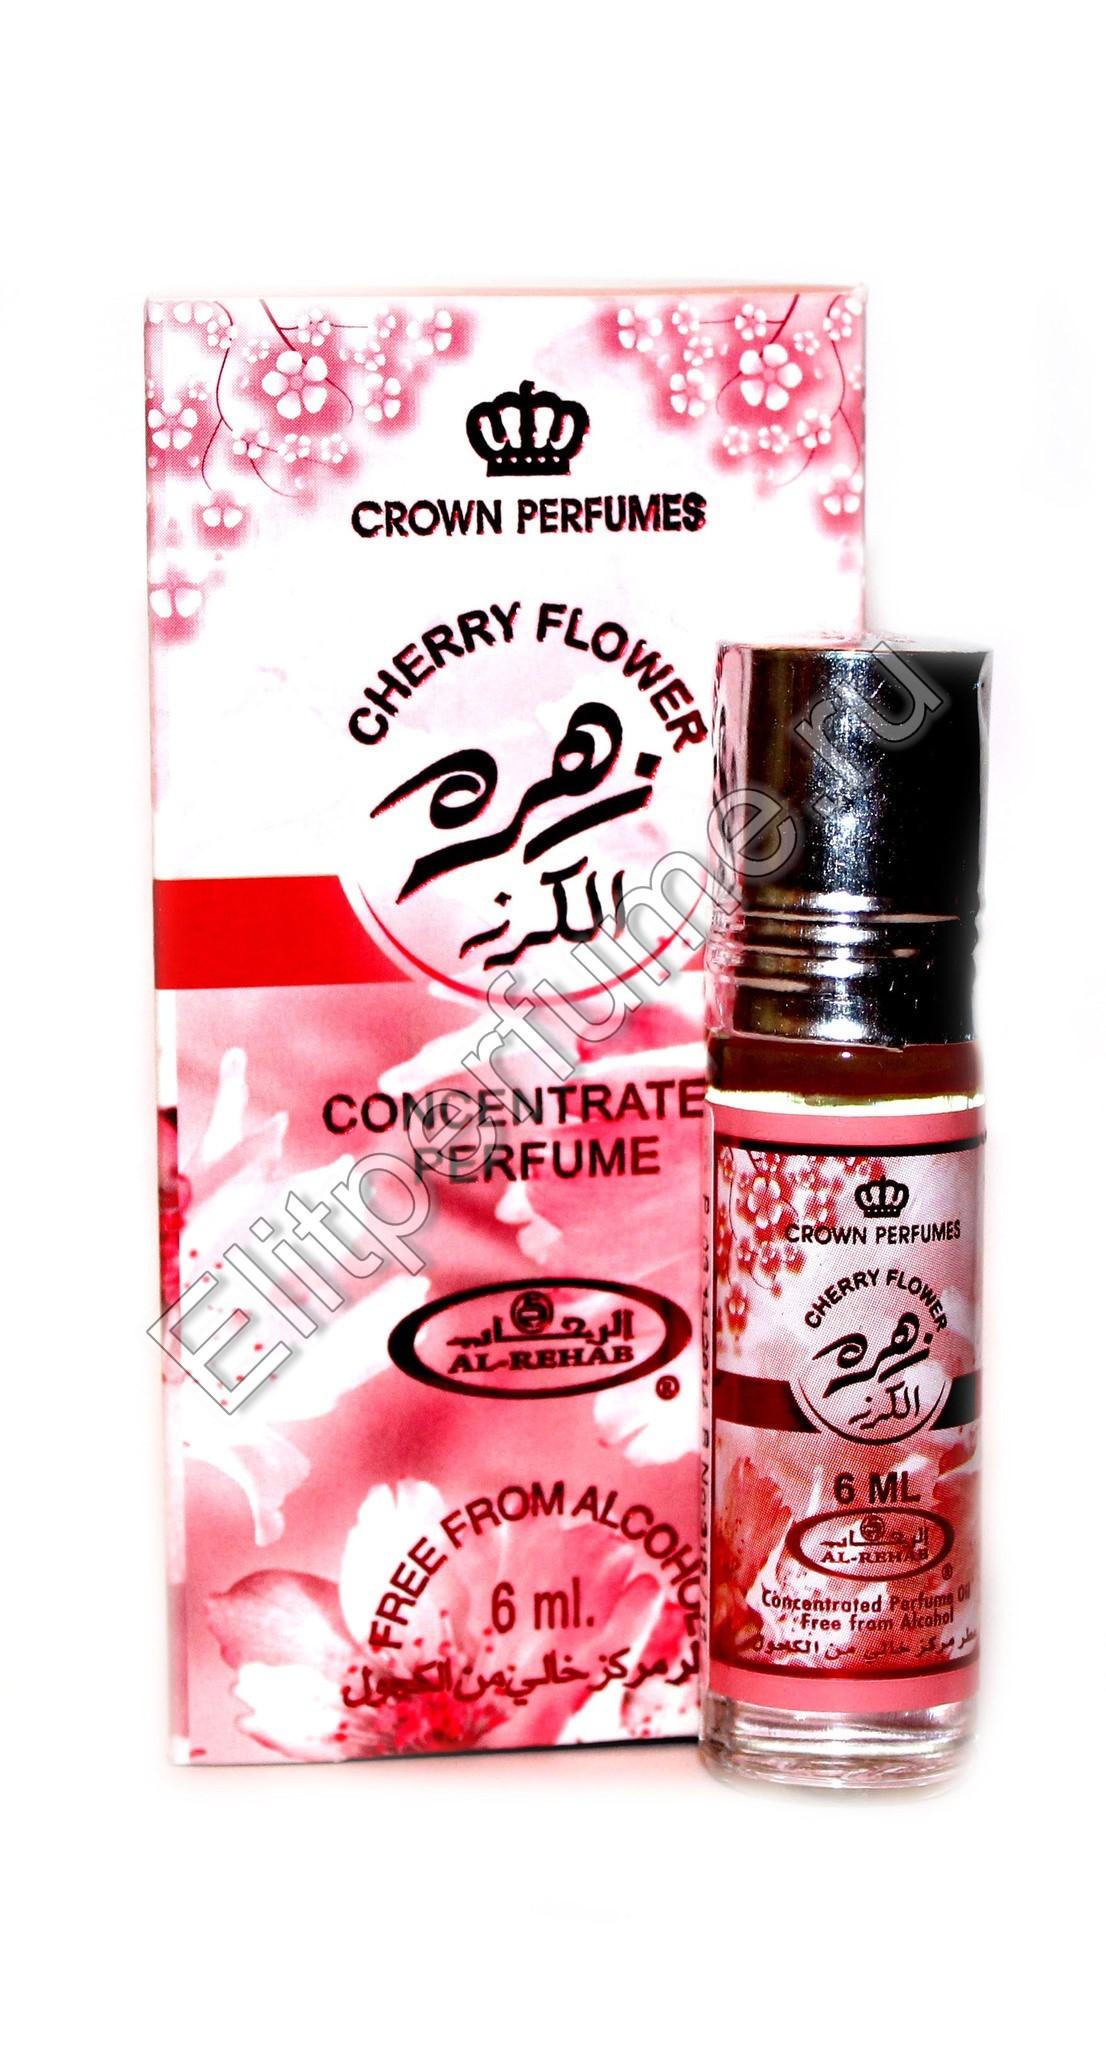 Cherry Flower Цветок Вишни 6 мл арабские масляные духи от Аль Рехаб Al Rehab